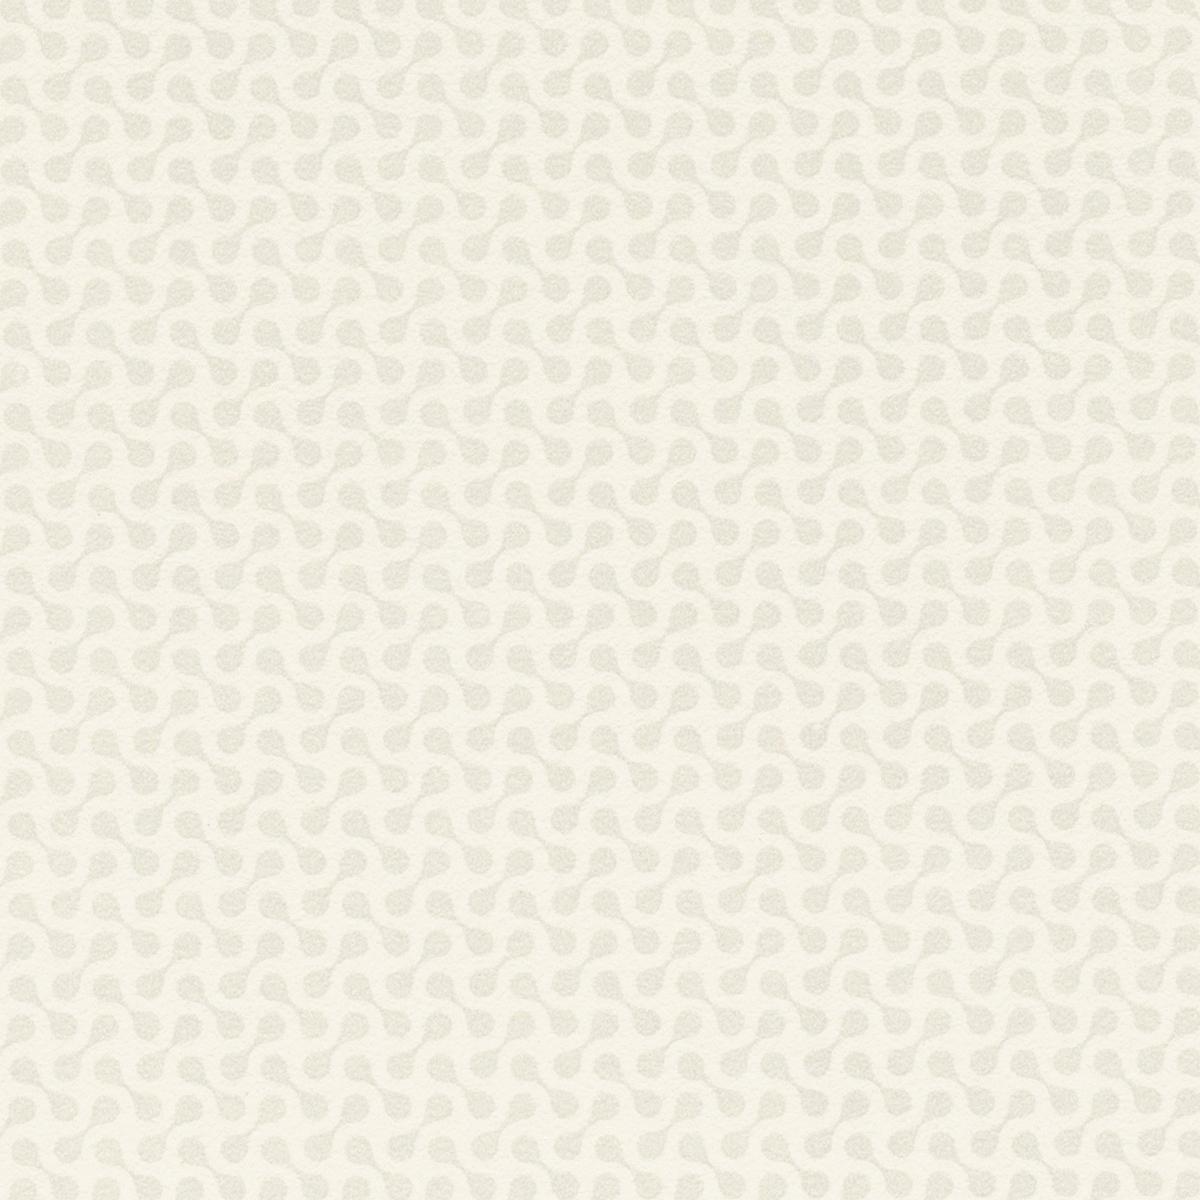 5281 Dogbone White - Formica